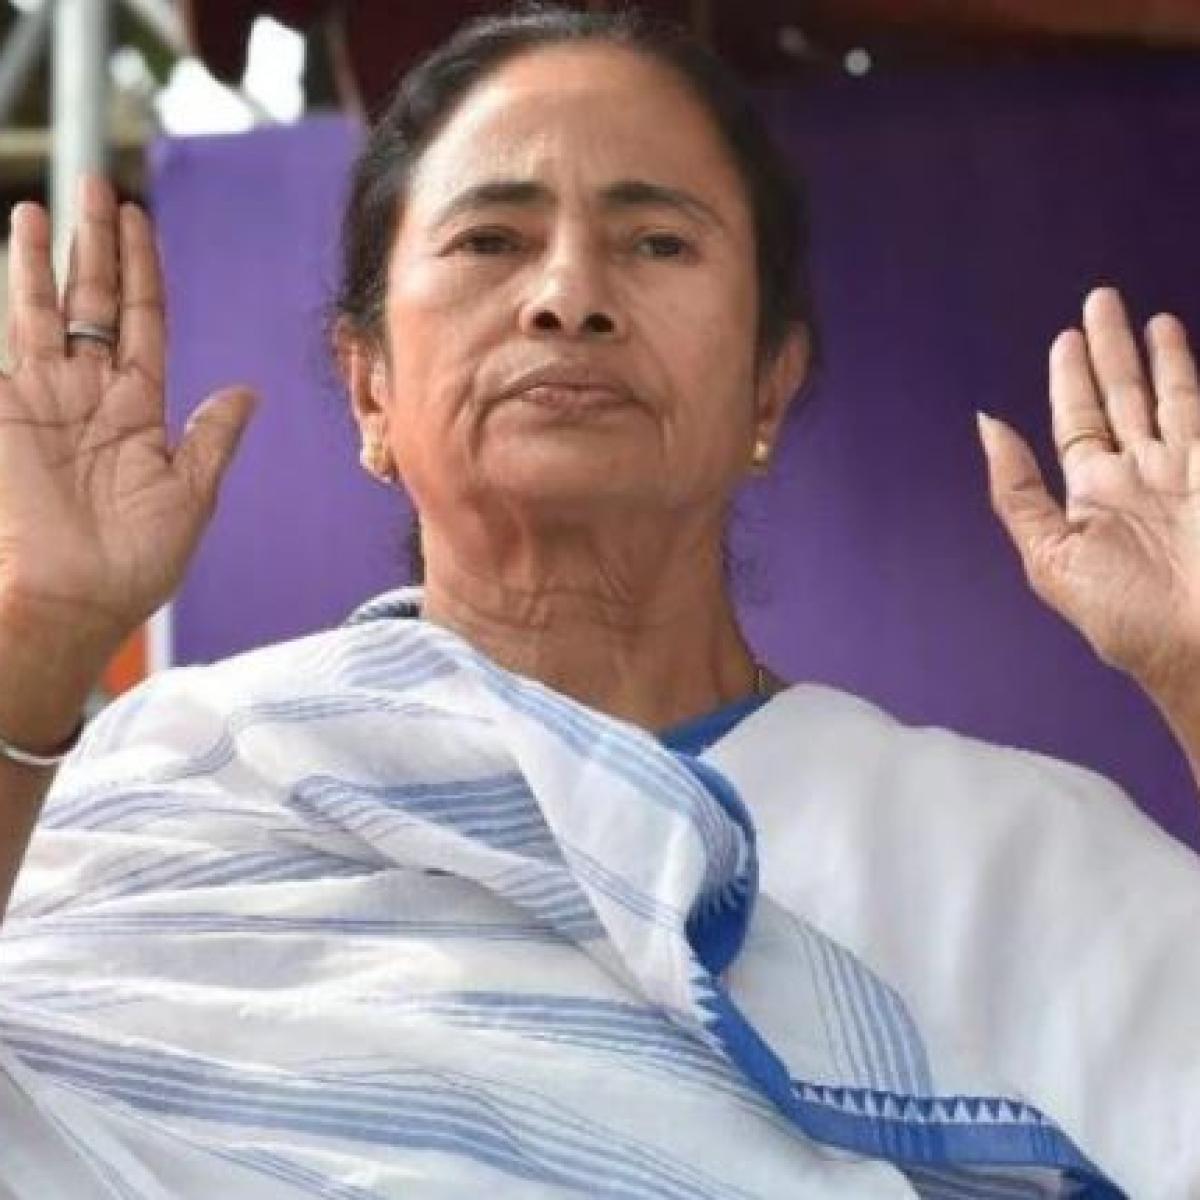 With Rhea Chakraborty under scanner, Kolkata Police writes to Twitter, Facebook over trolls targeting Bengali women